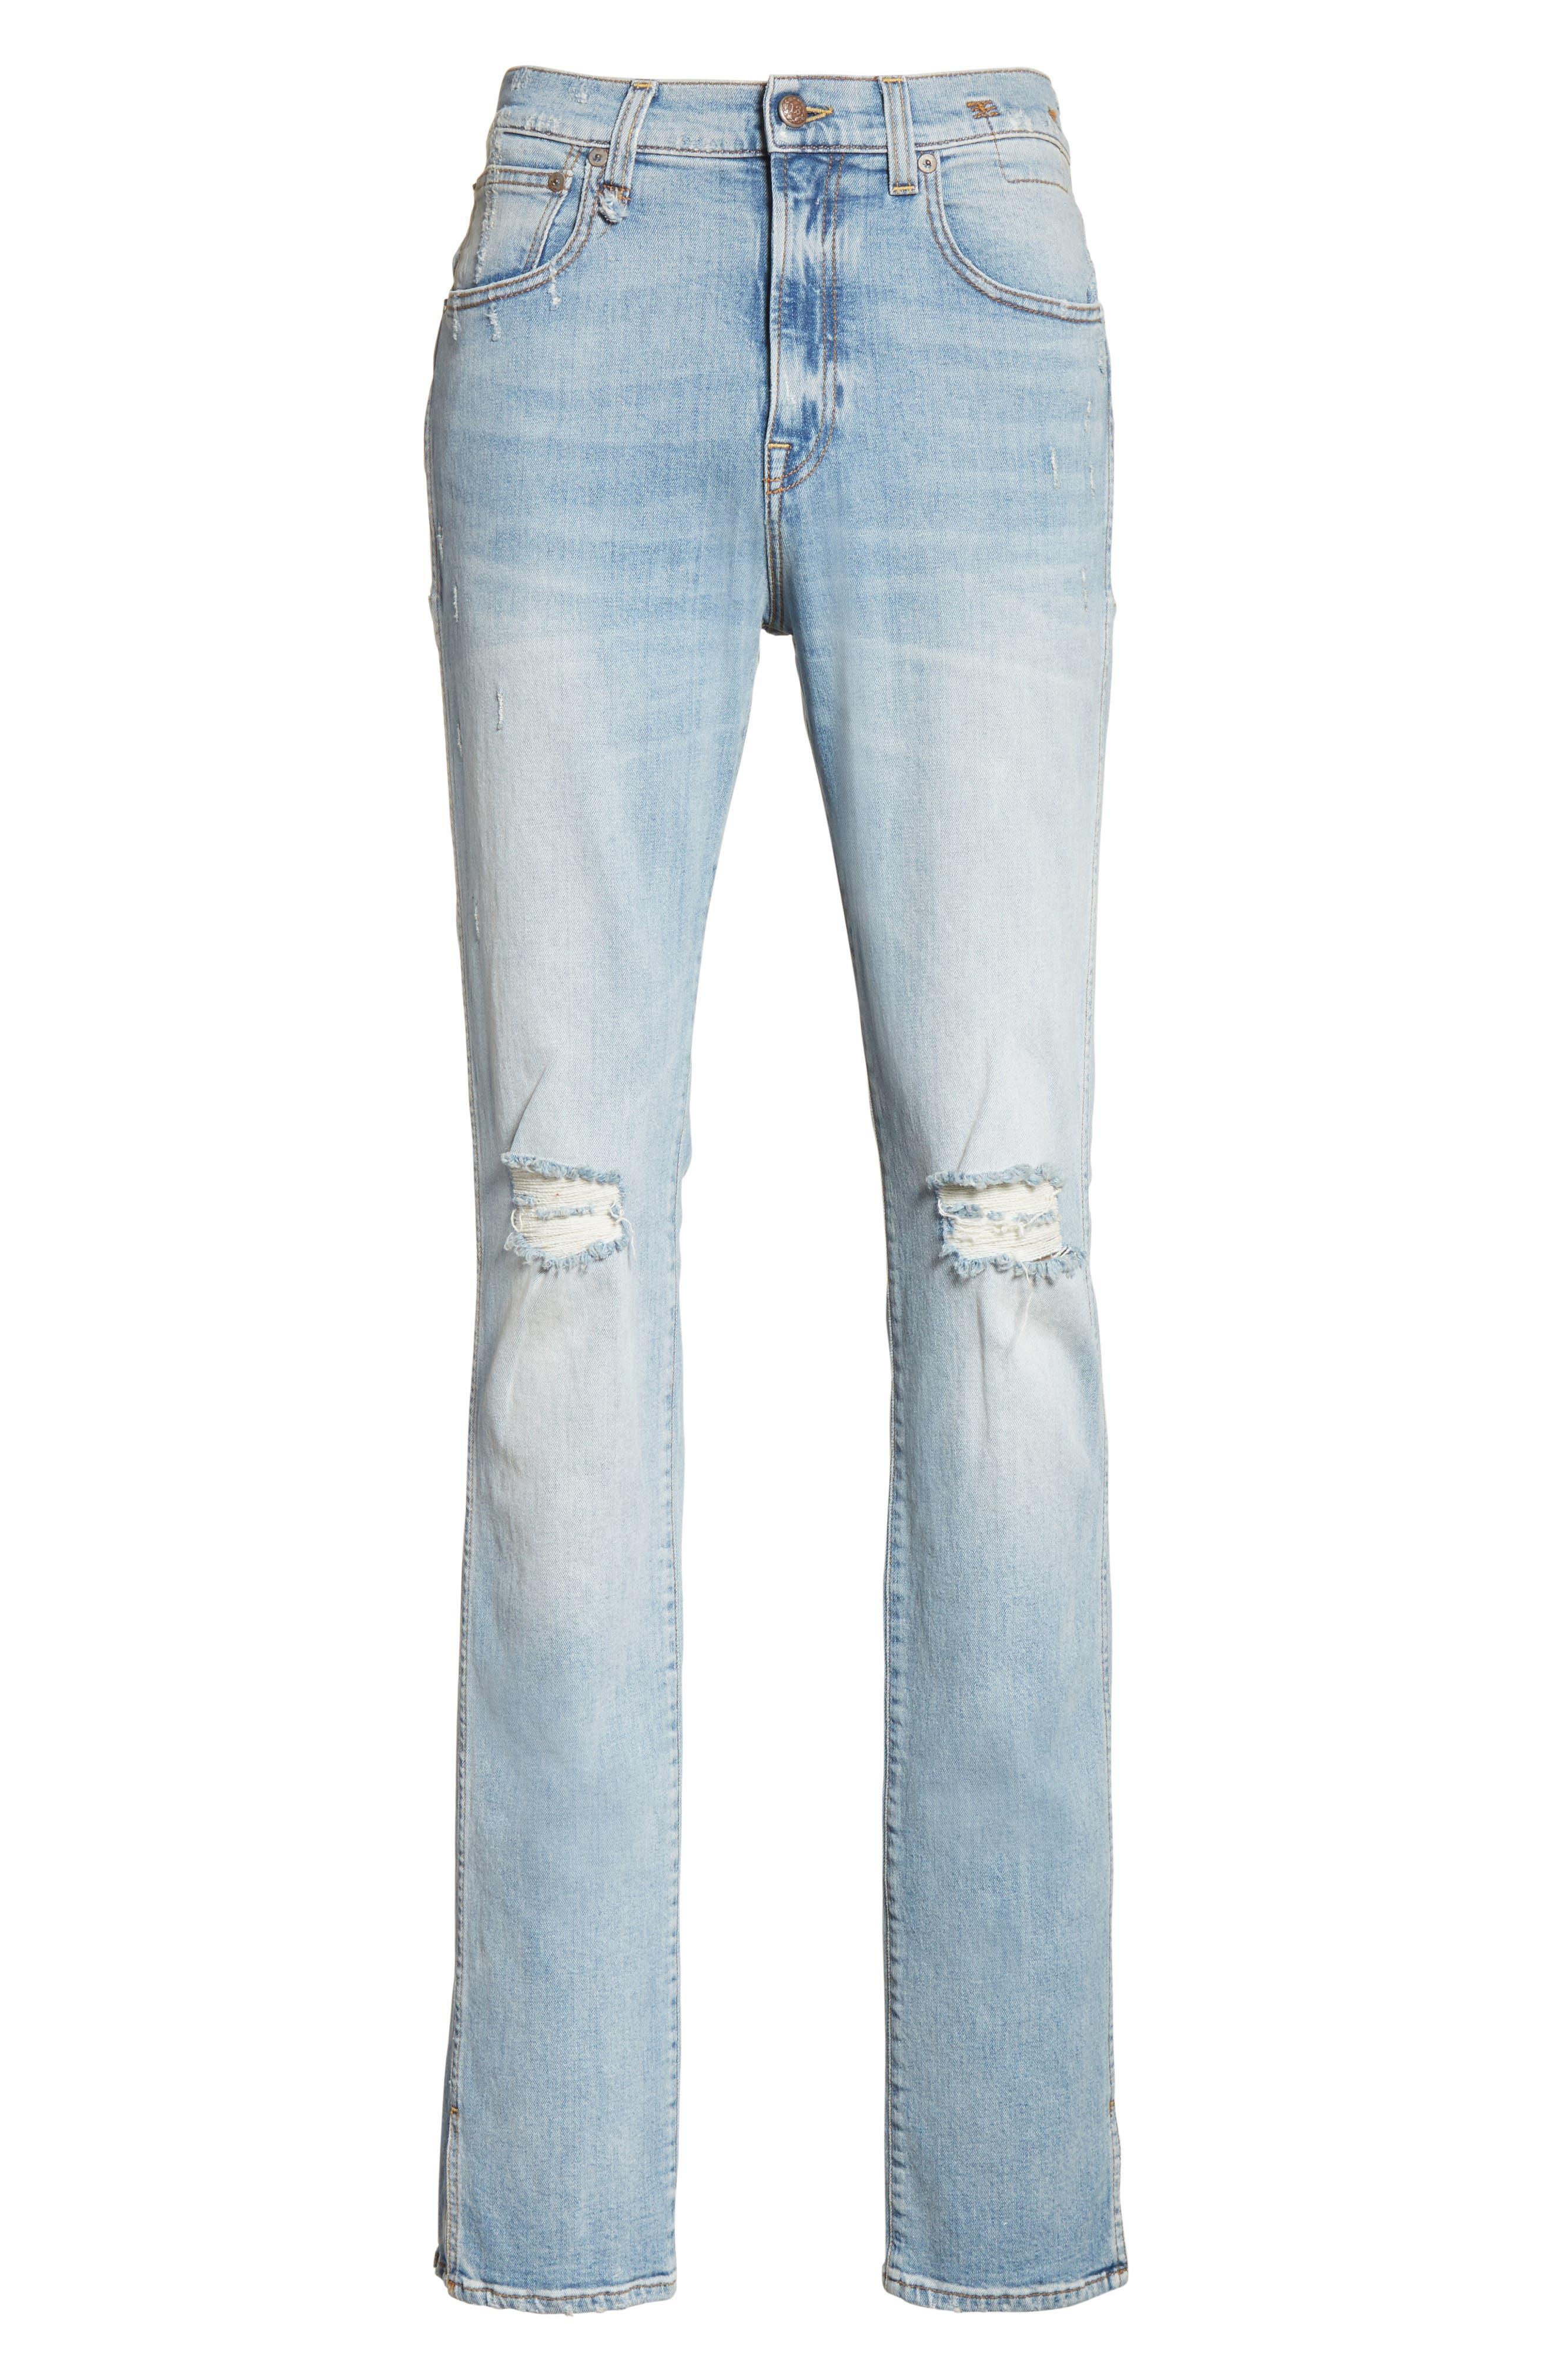 Deacon Skate Skinny Fit Jeans,                             Alternate thumbnail 6, color,                             400